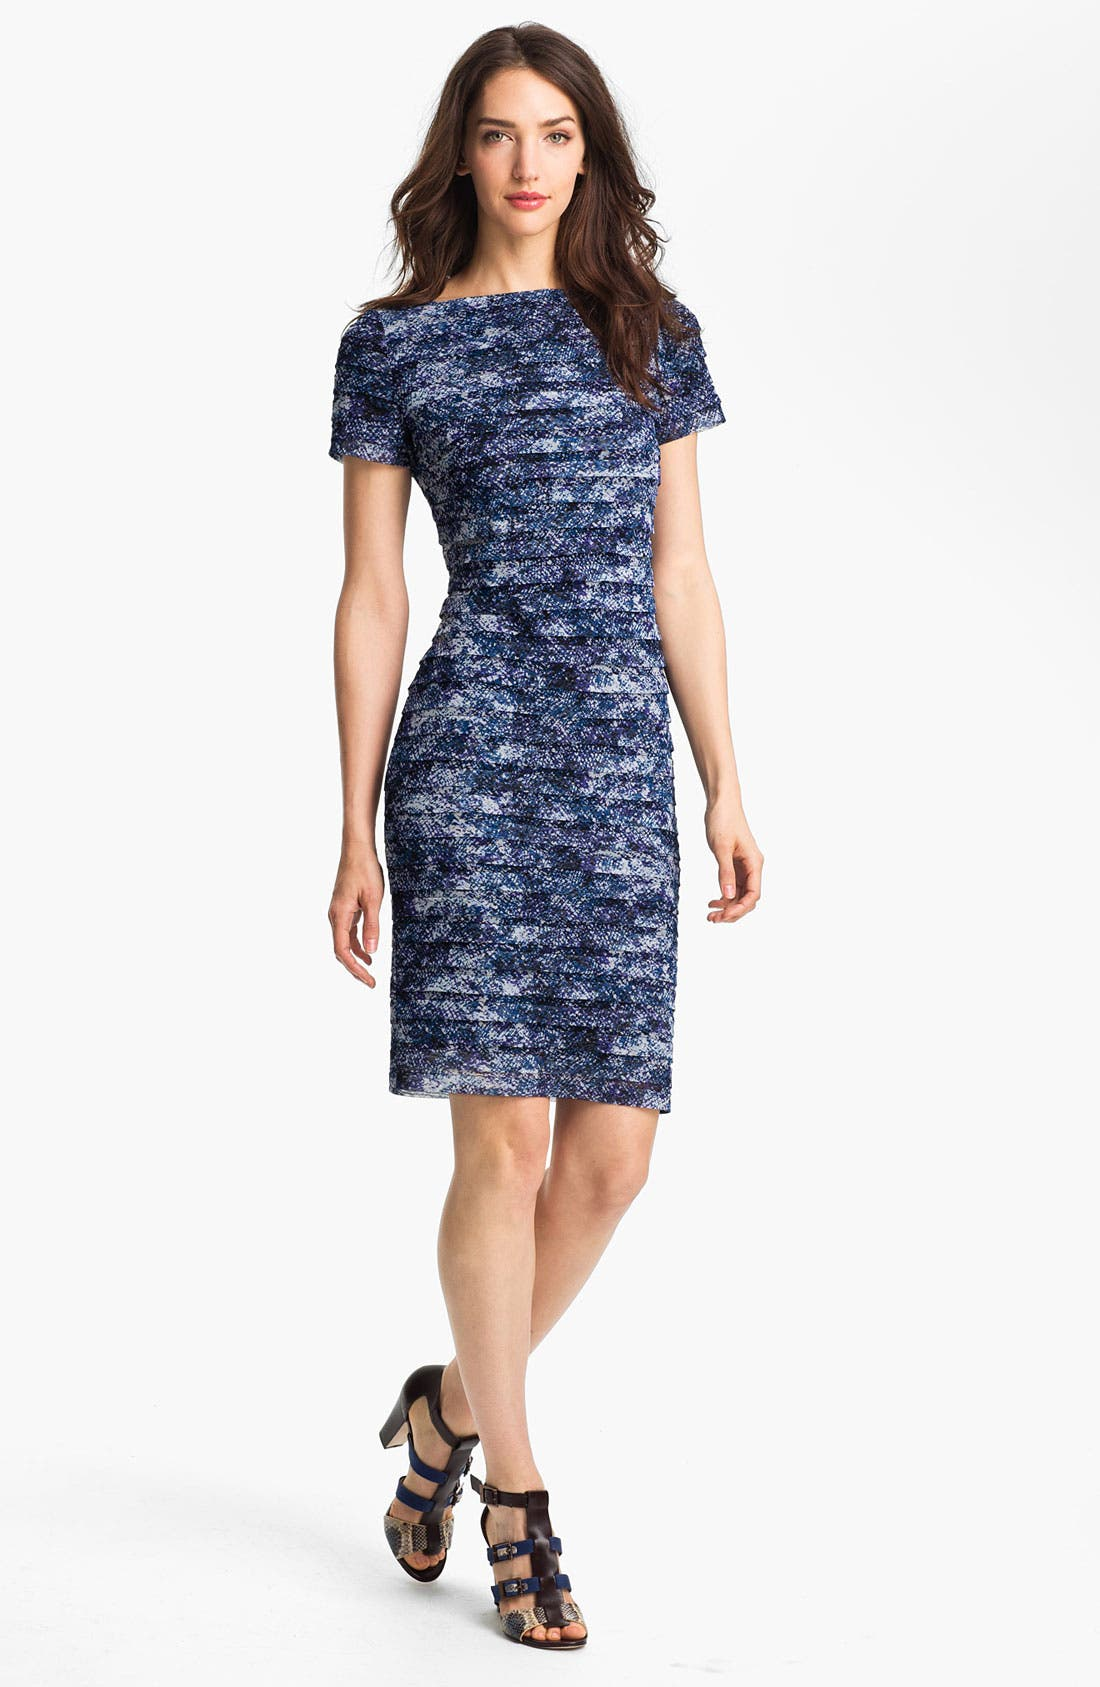 Alternate Image 1 Selected - Adrianna Papell Print Sheath Dress